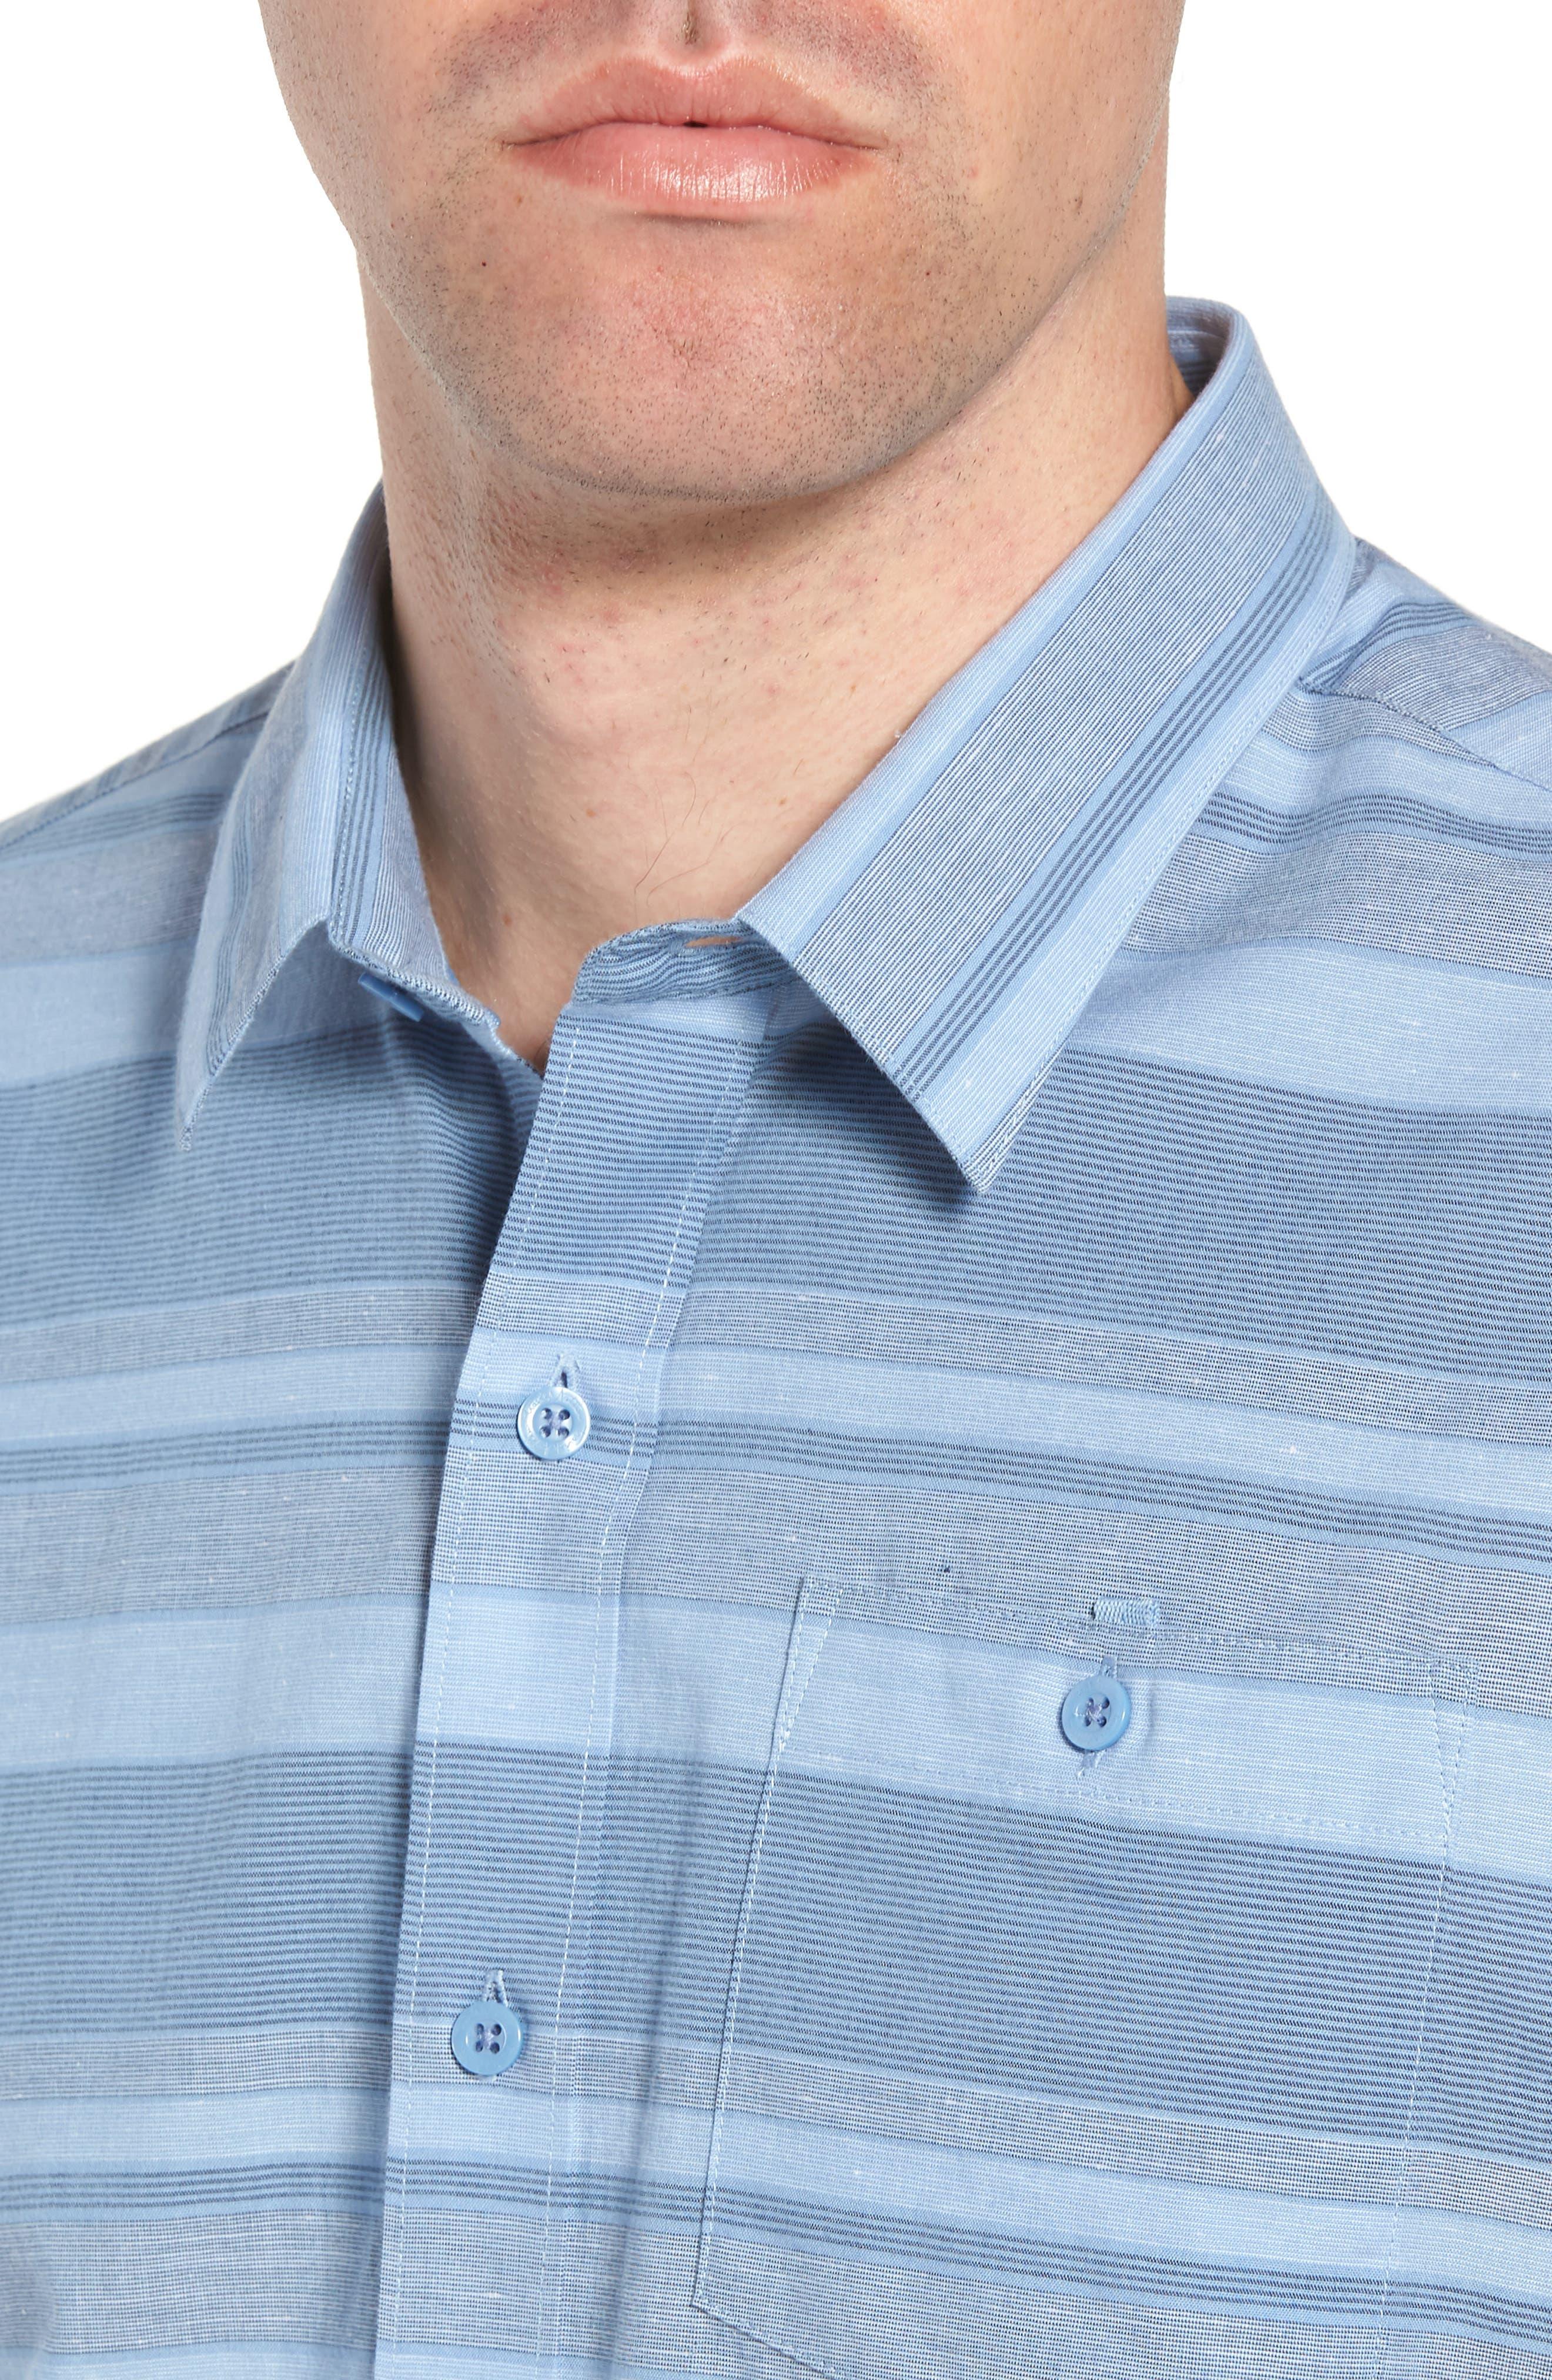 Mahe Regular Fit Sport Shirt,                             Alternate thumbnail 2, color,                             Heather Blue Nights